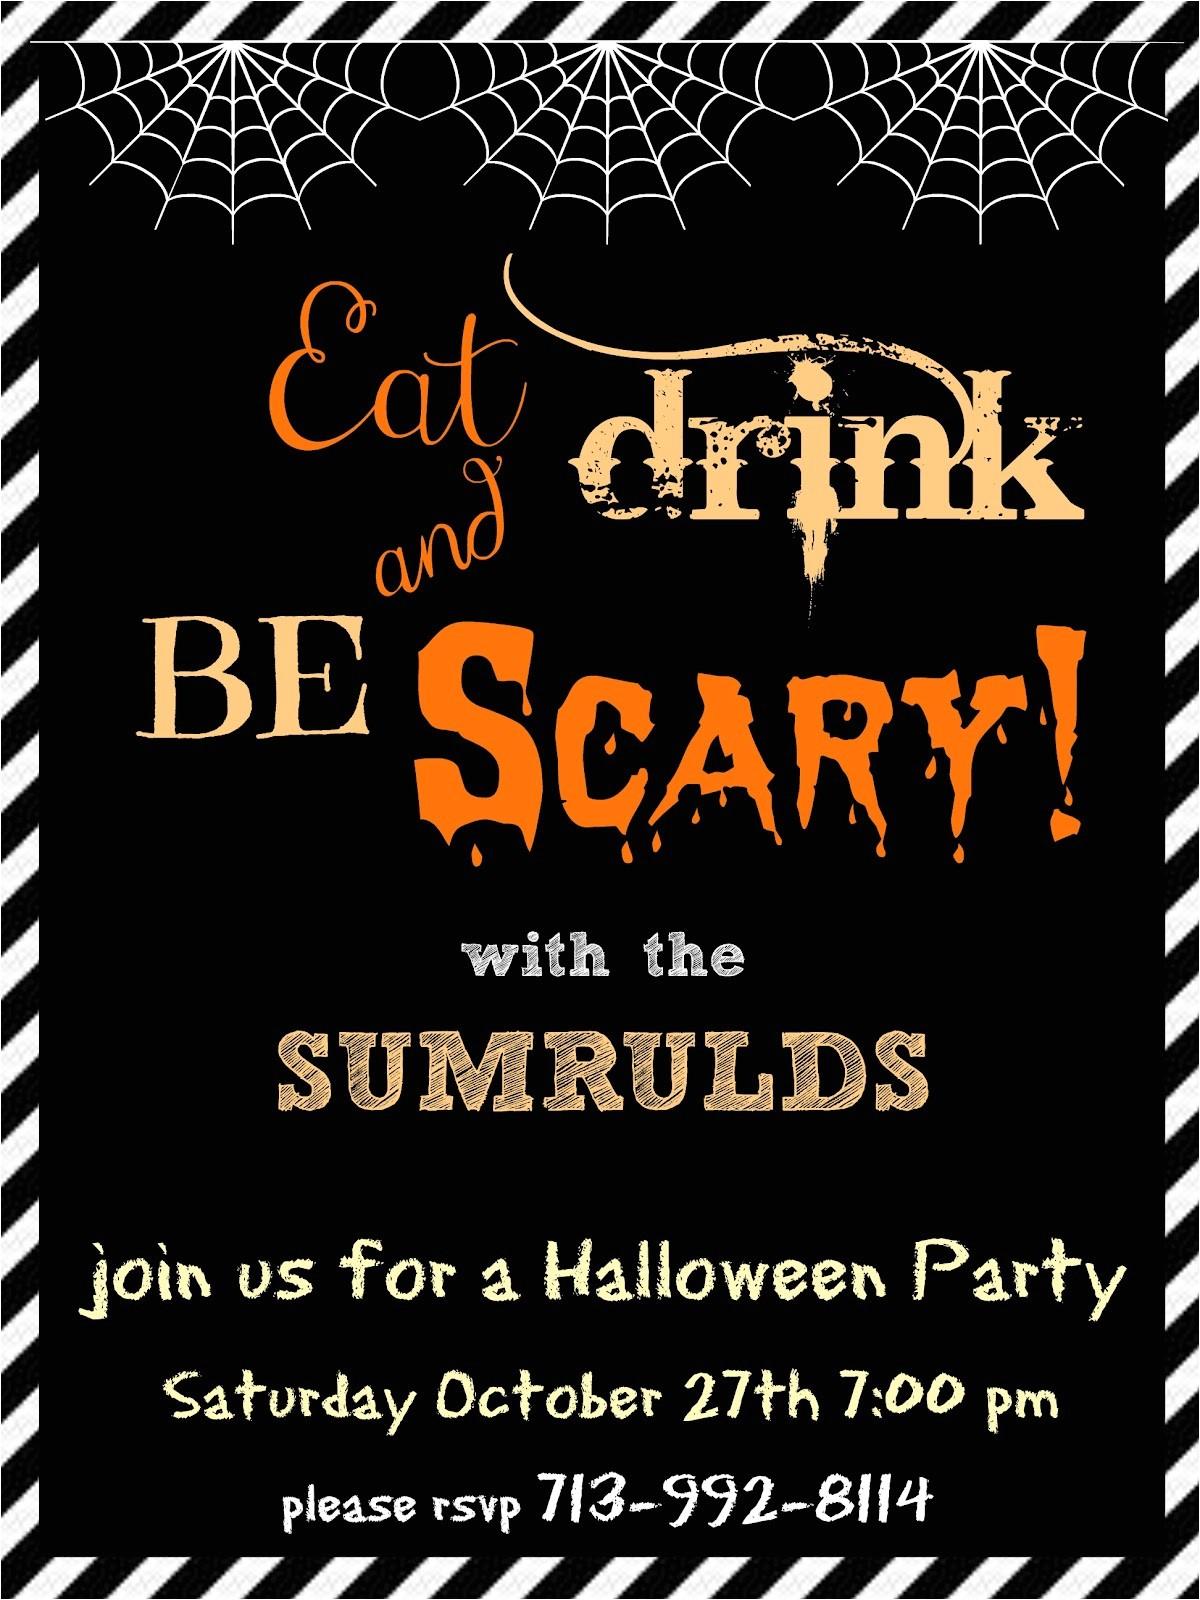 halloween party invitations please help